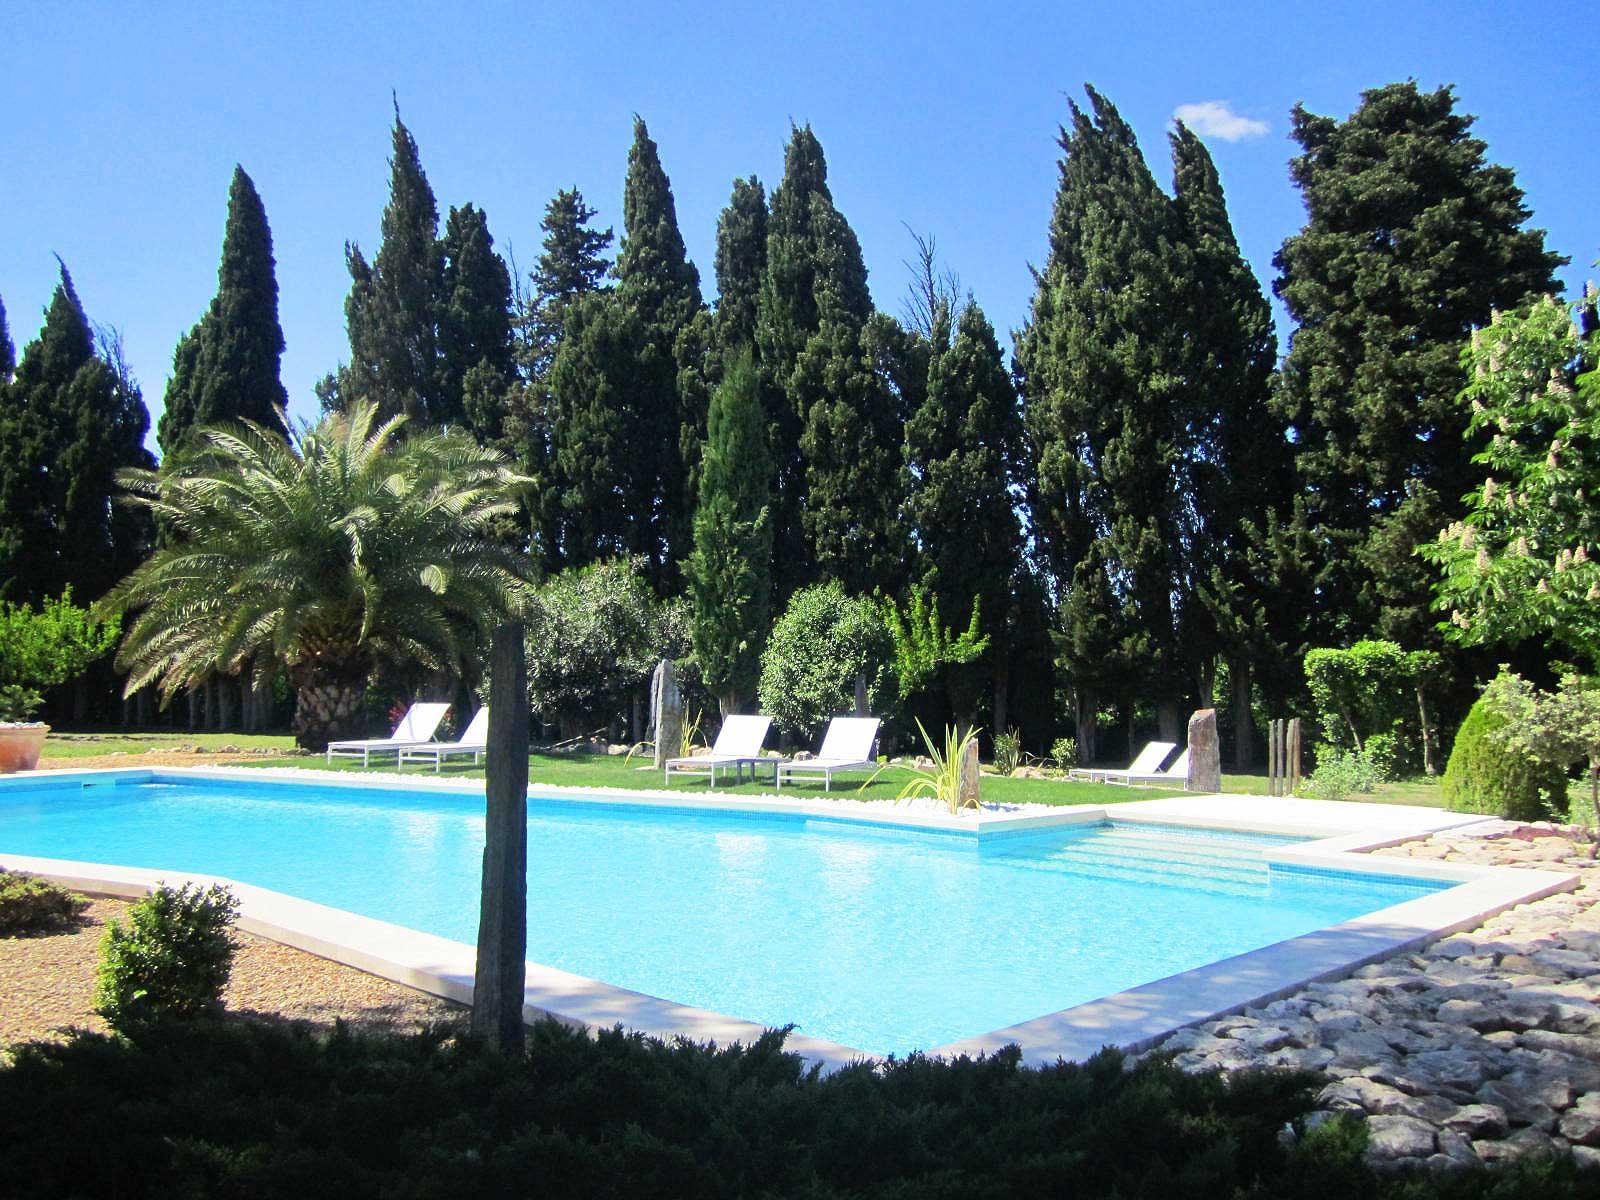 Chambre d hote maillane affordable maison de village for Salon piscine avignon 2017